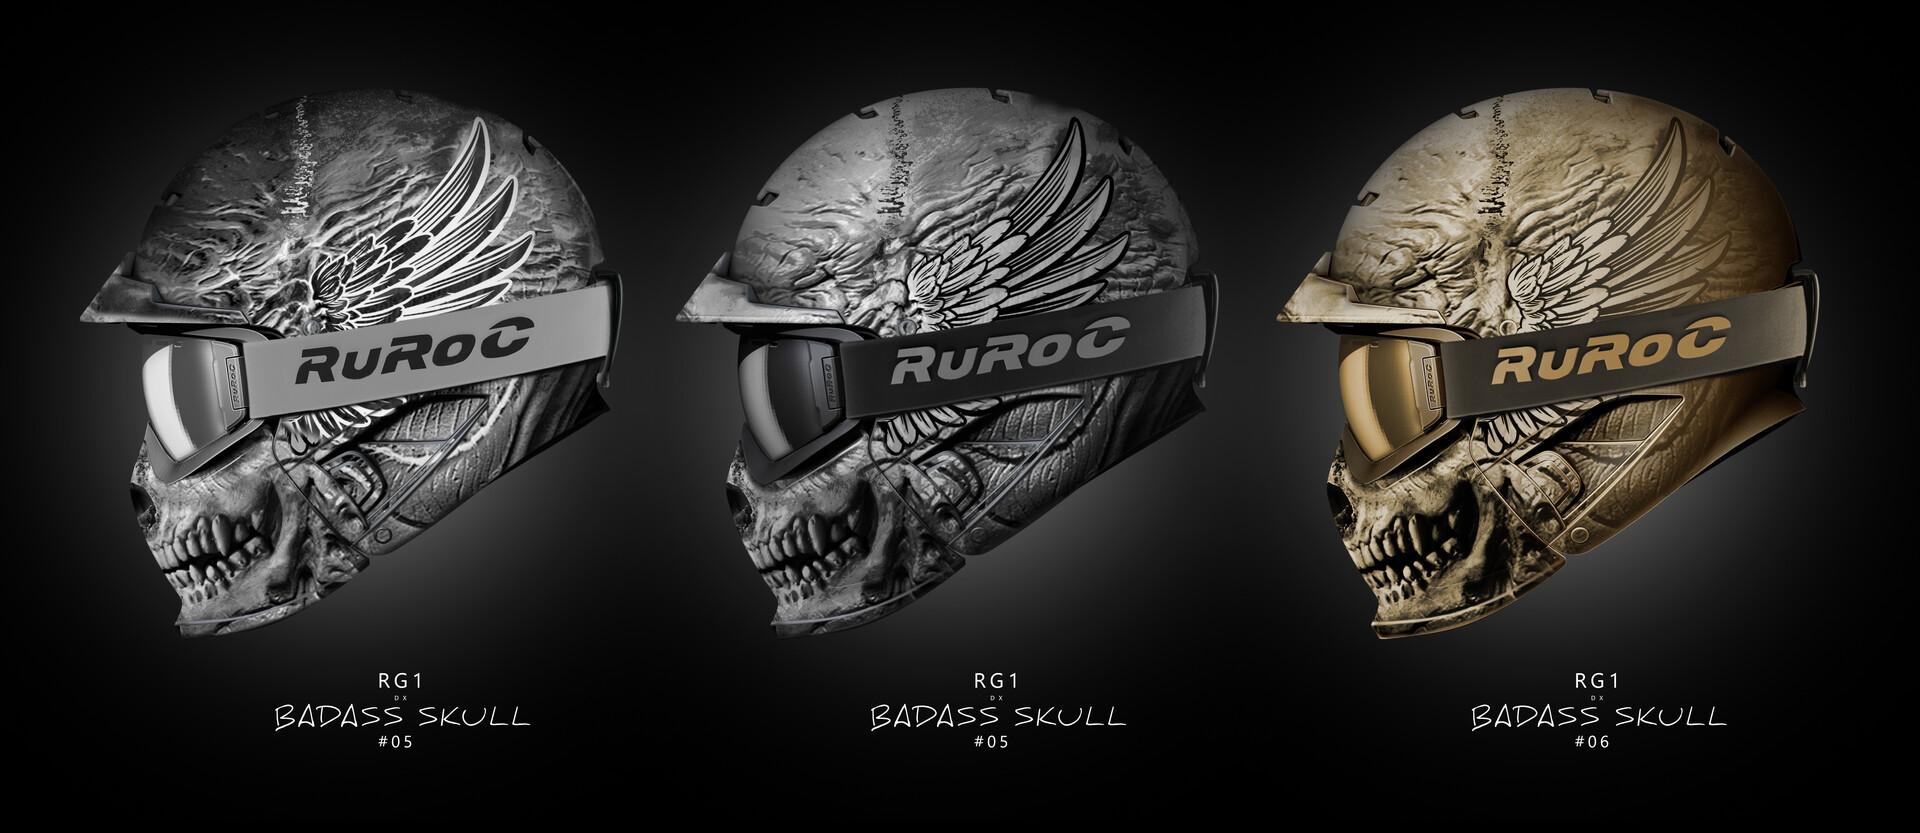 Pablo olivera ruroc bx ass skull 4